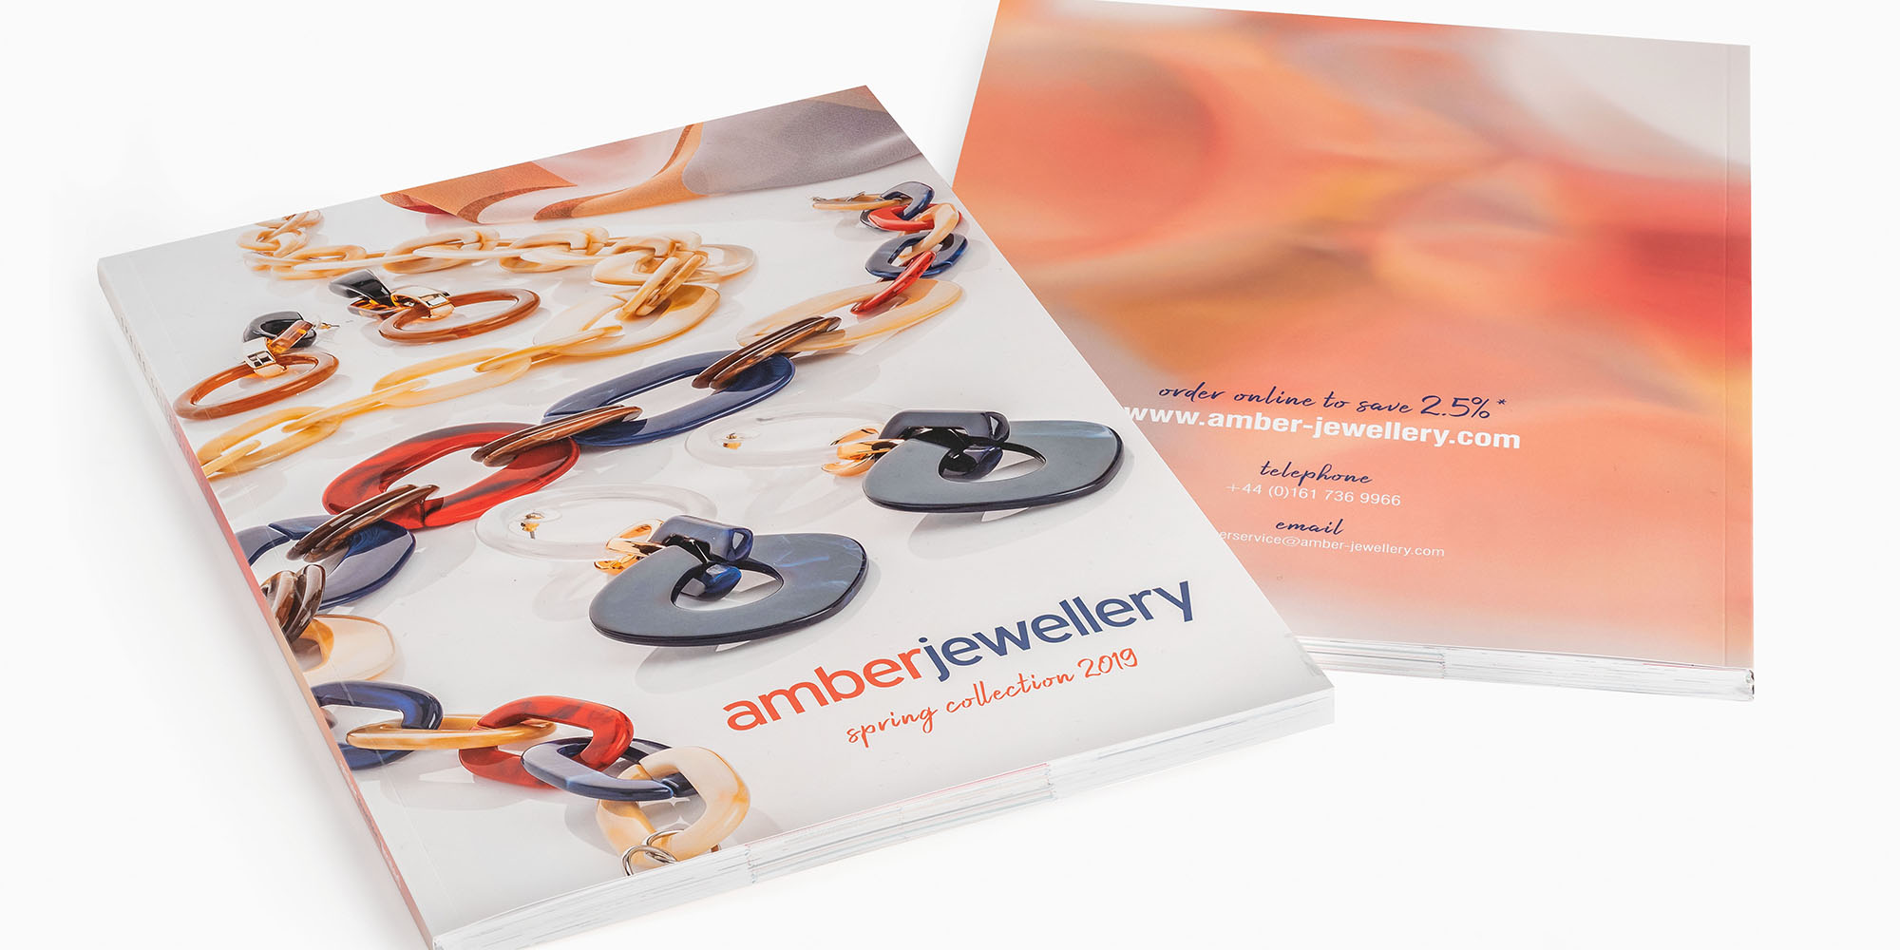 Spring 2019 Amber Jewellery Brochure.